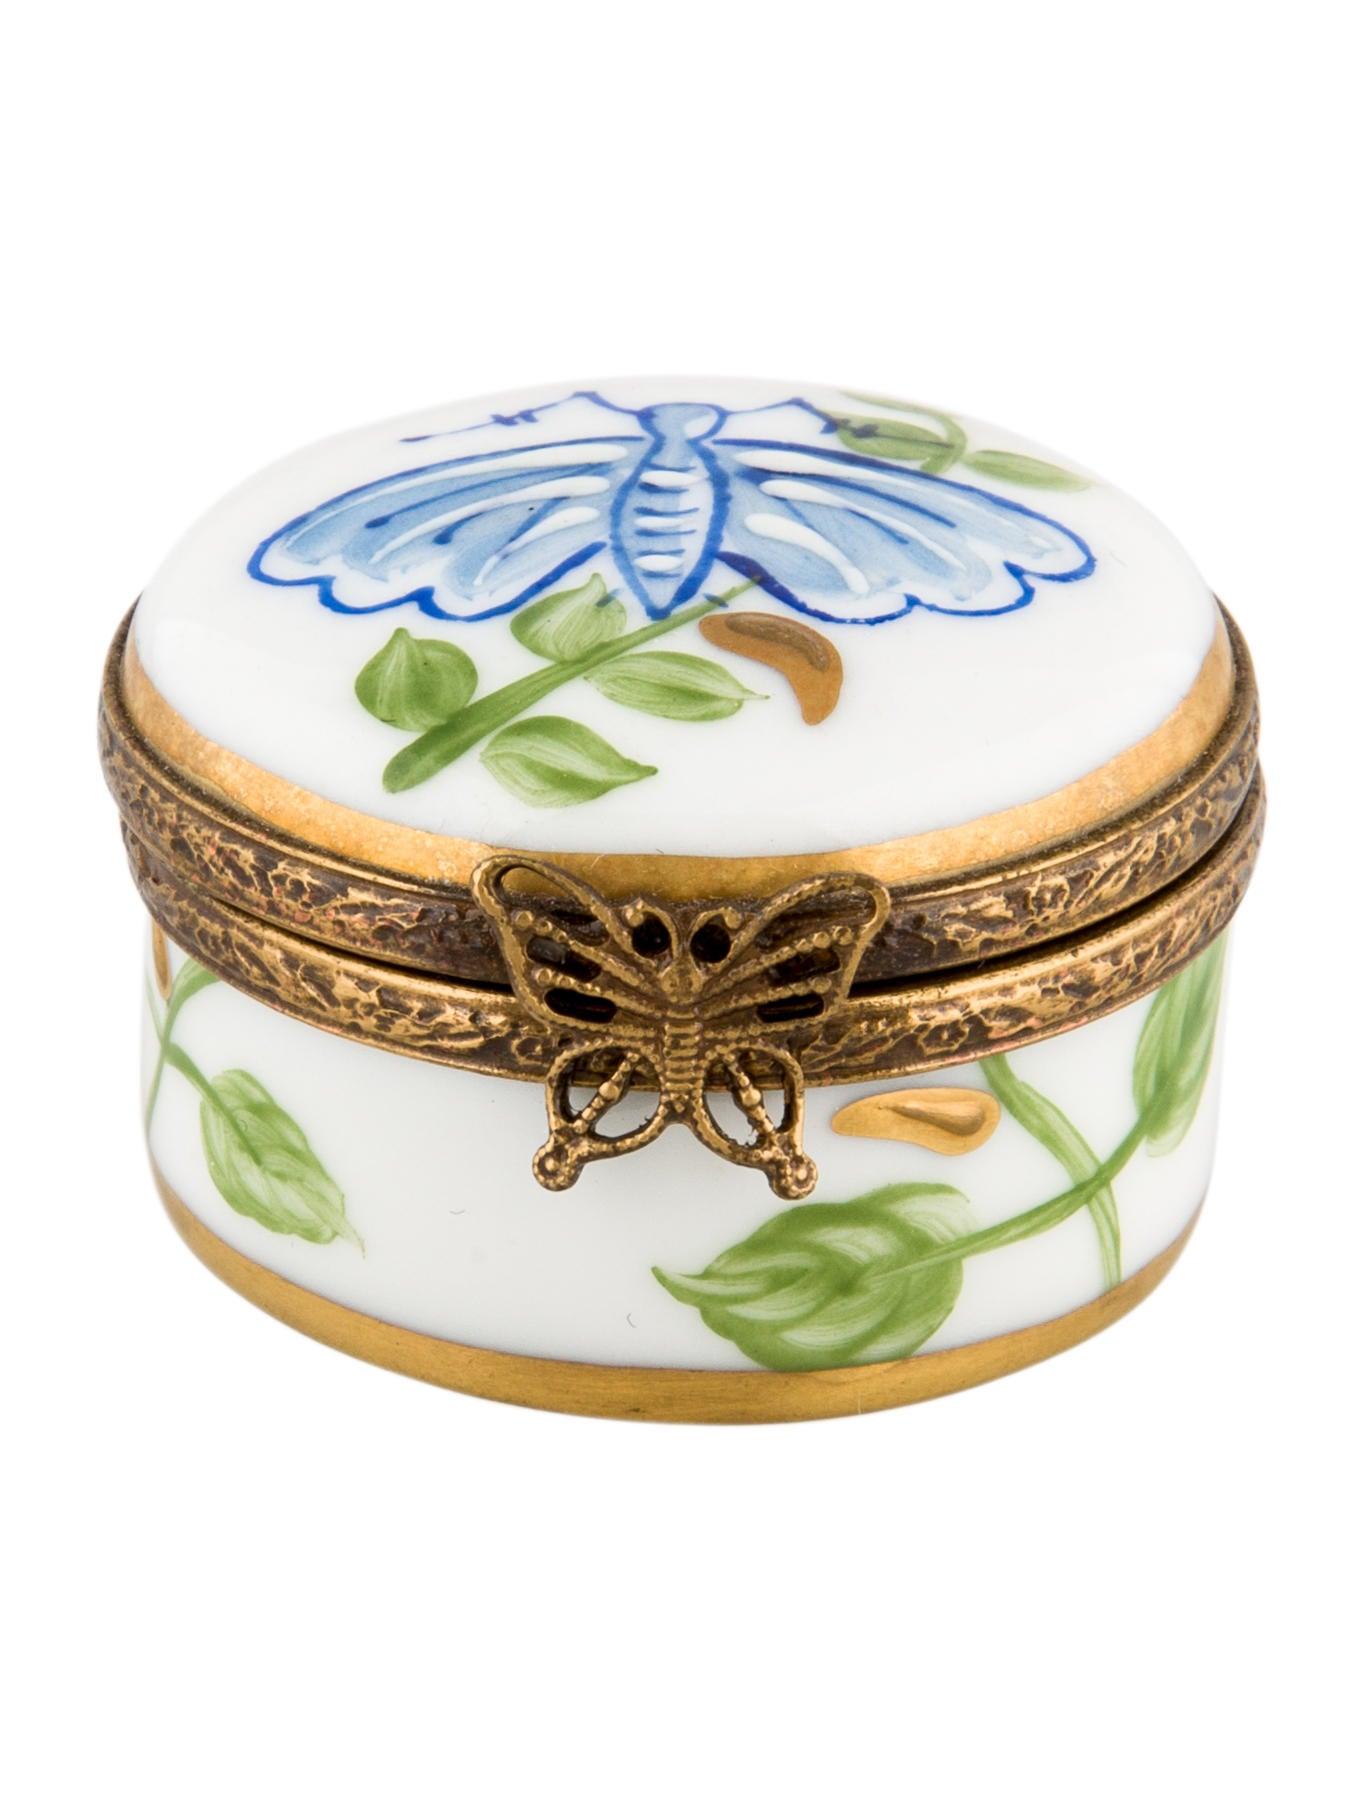 limoges laure s lignac butterfly trinket box decor and. Black Bedroom Furniture Sets. Home Design Ideas